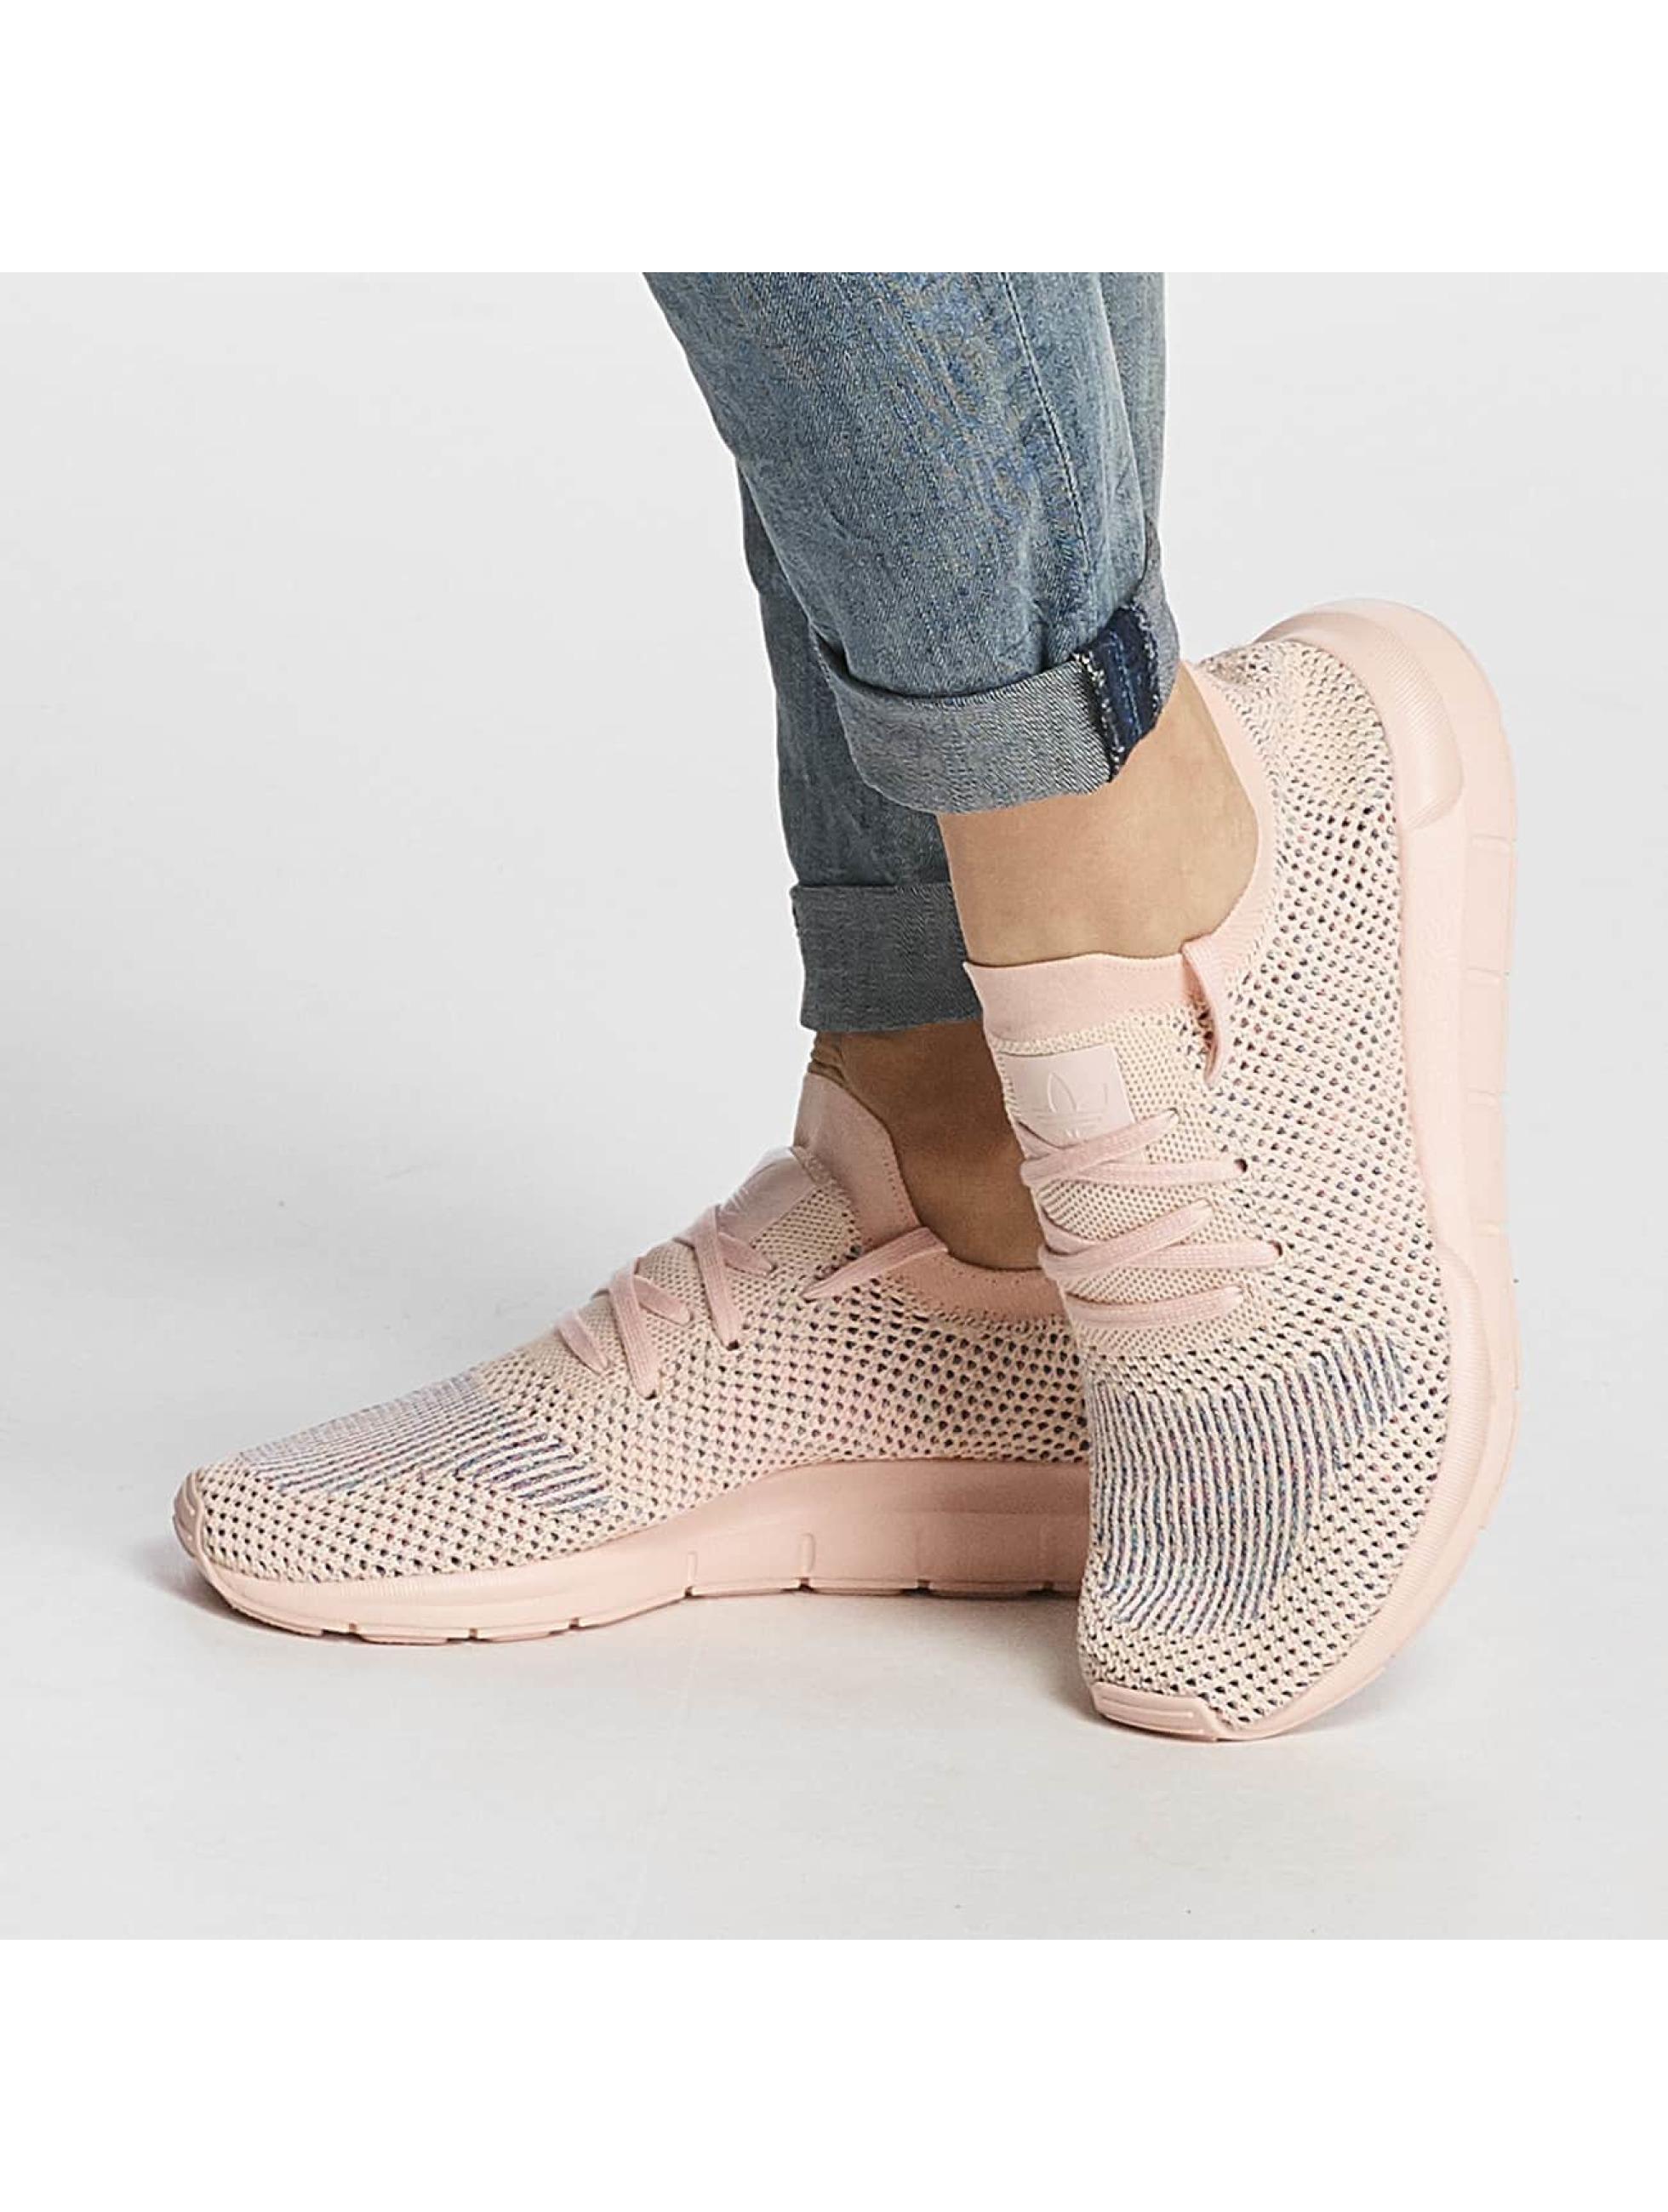 adidas Sneakers Swift Run Primeknit pink